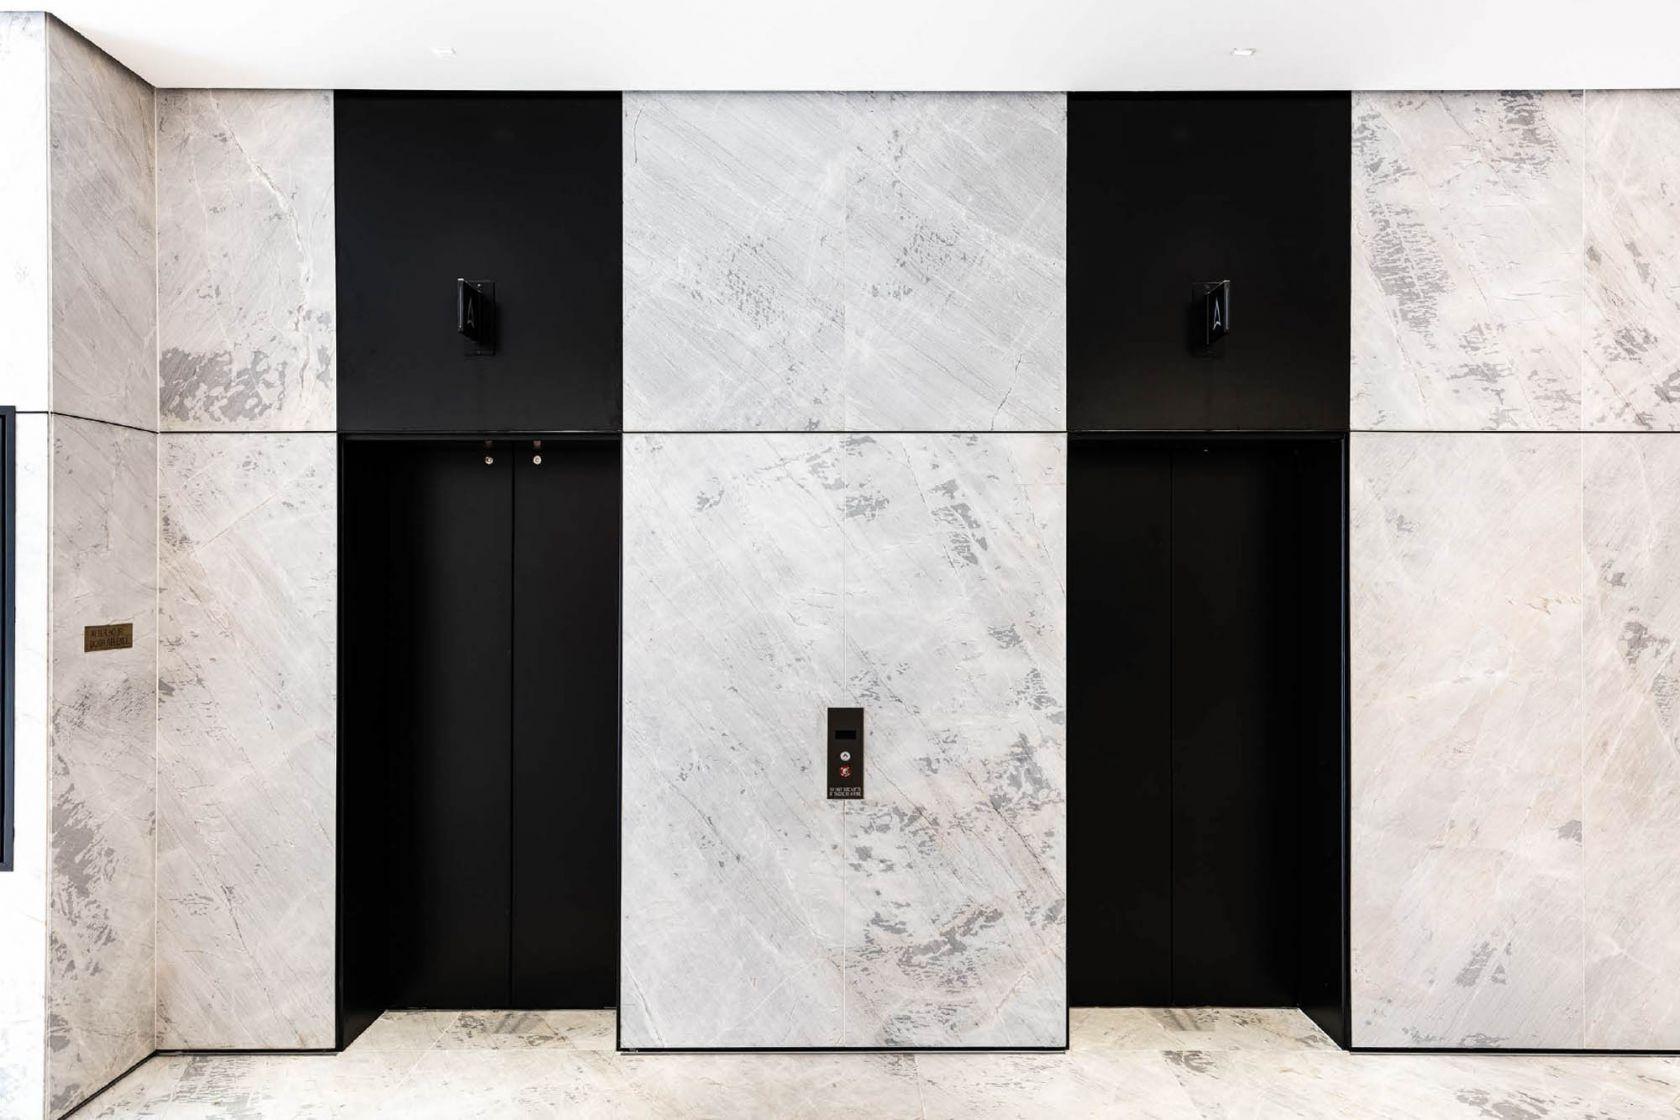 151 Macquarie Street interior construction asset refurbishment Sydney lift lobby marble monochrome